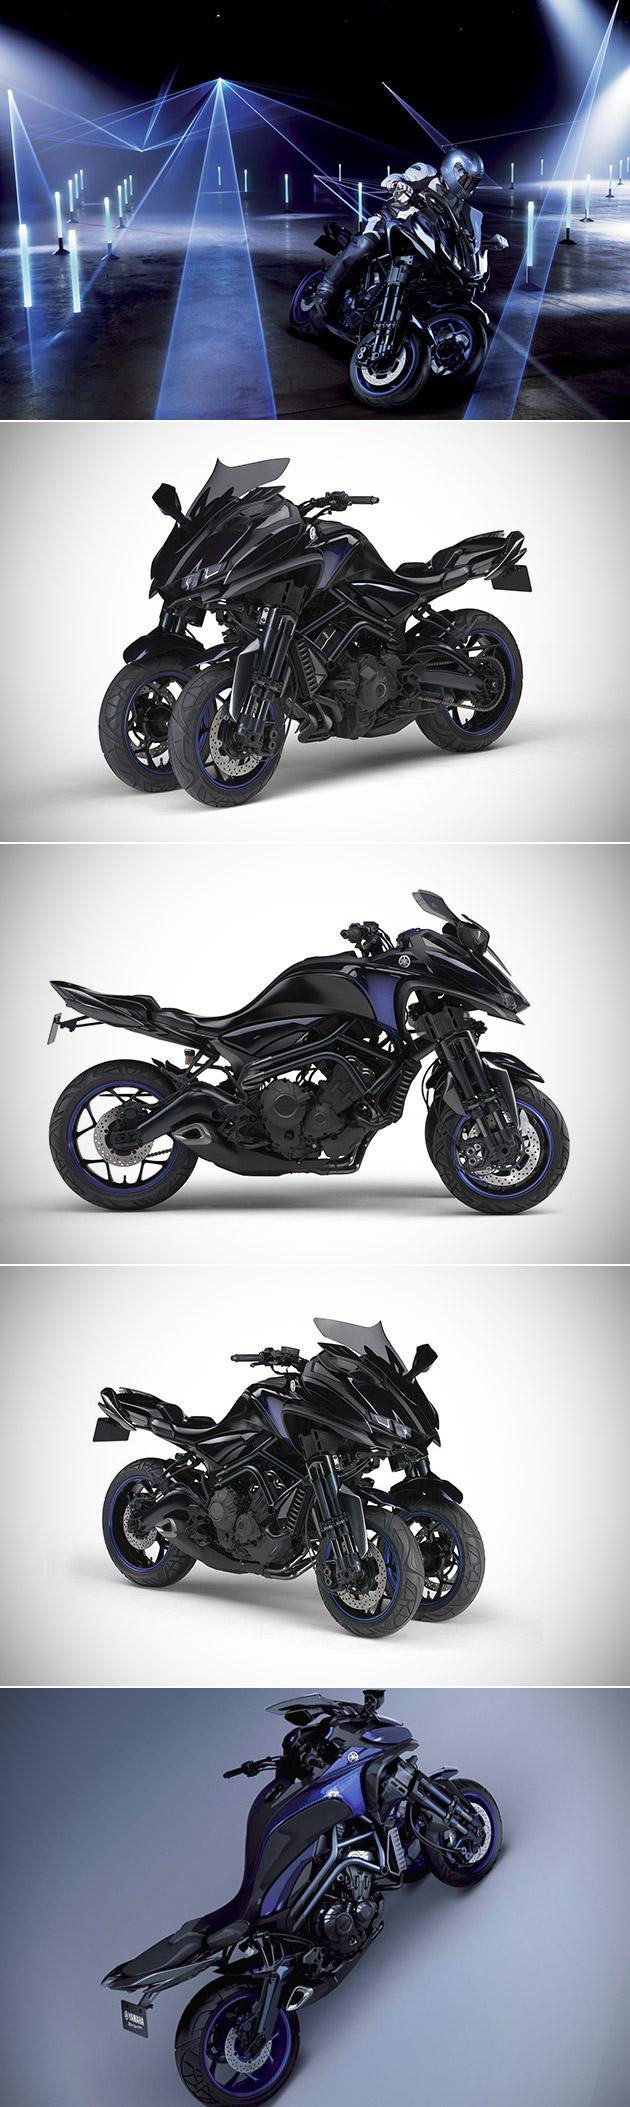 Yamaha MWT-9 Leaning Trike